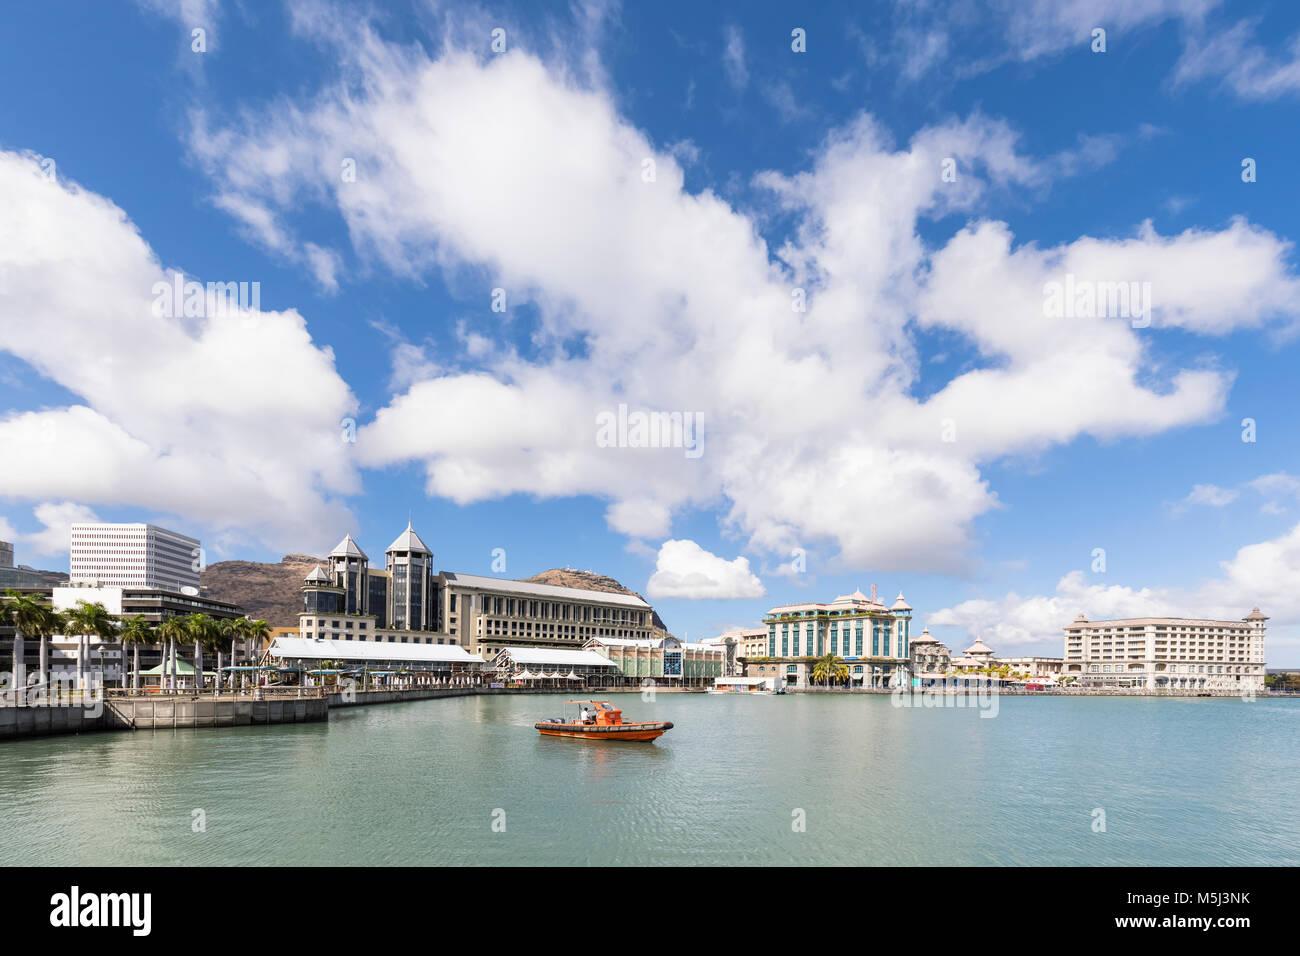 Mauritius, Port Louis, Caudan Waterfront Stock Photo